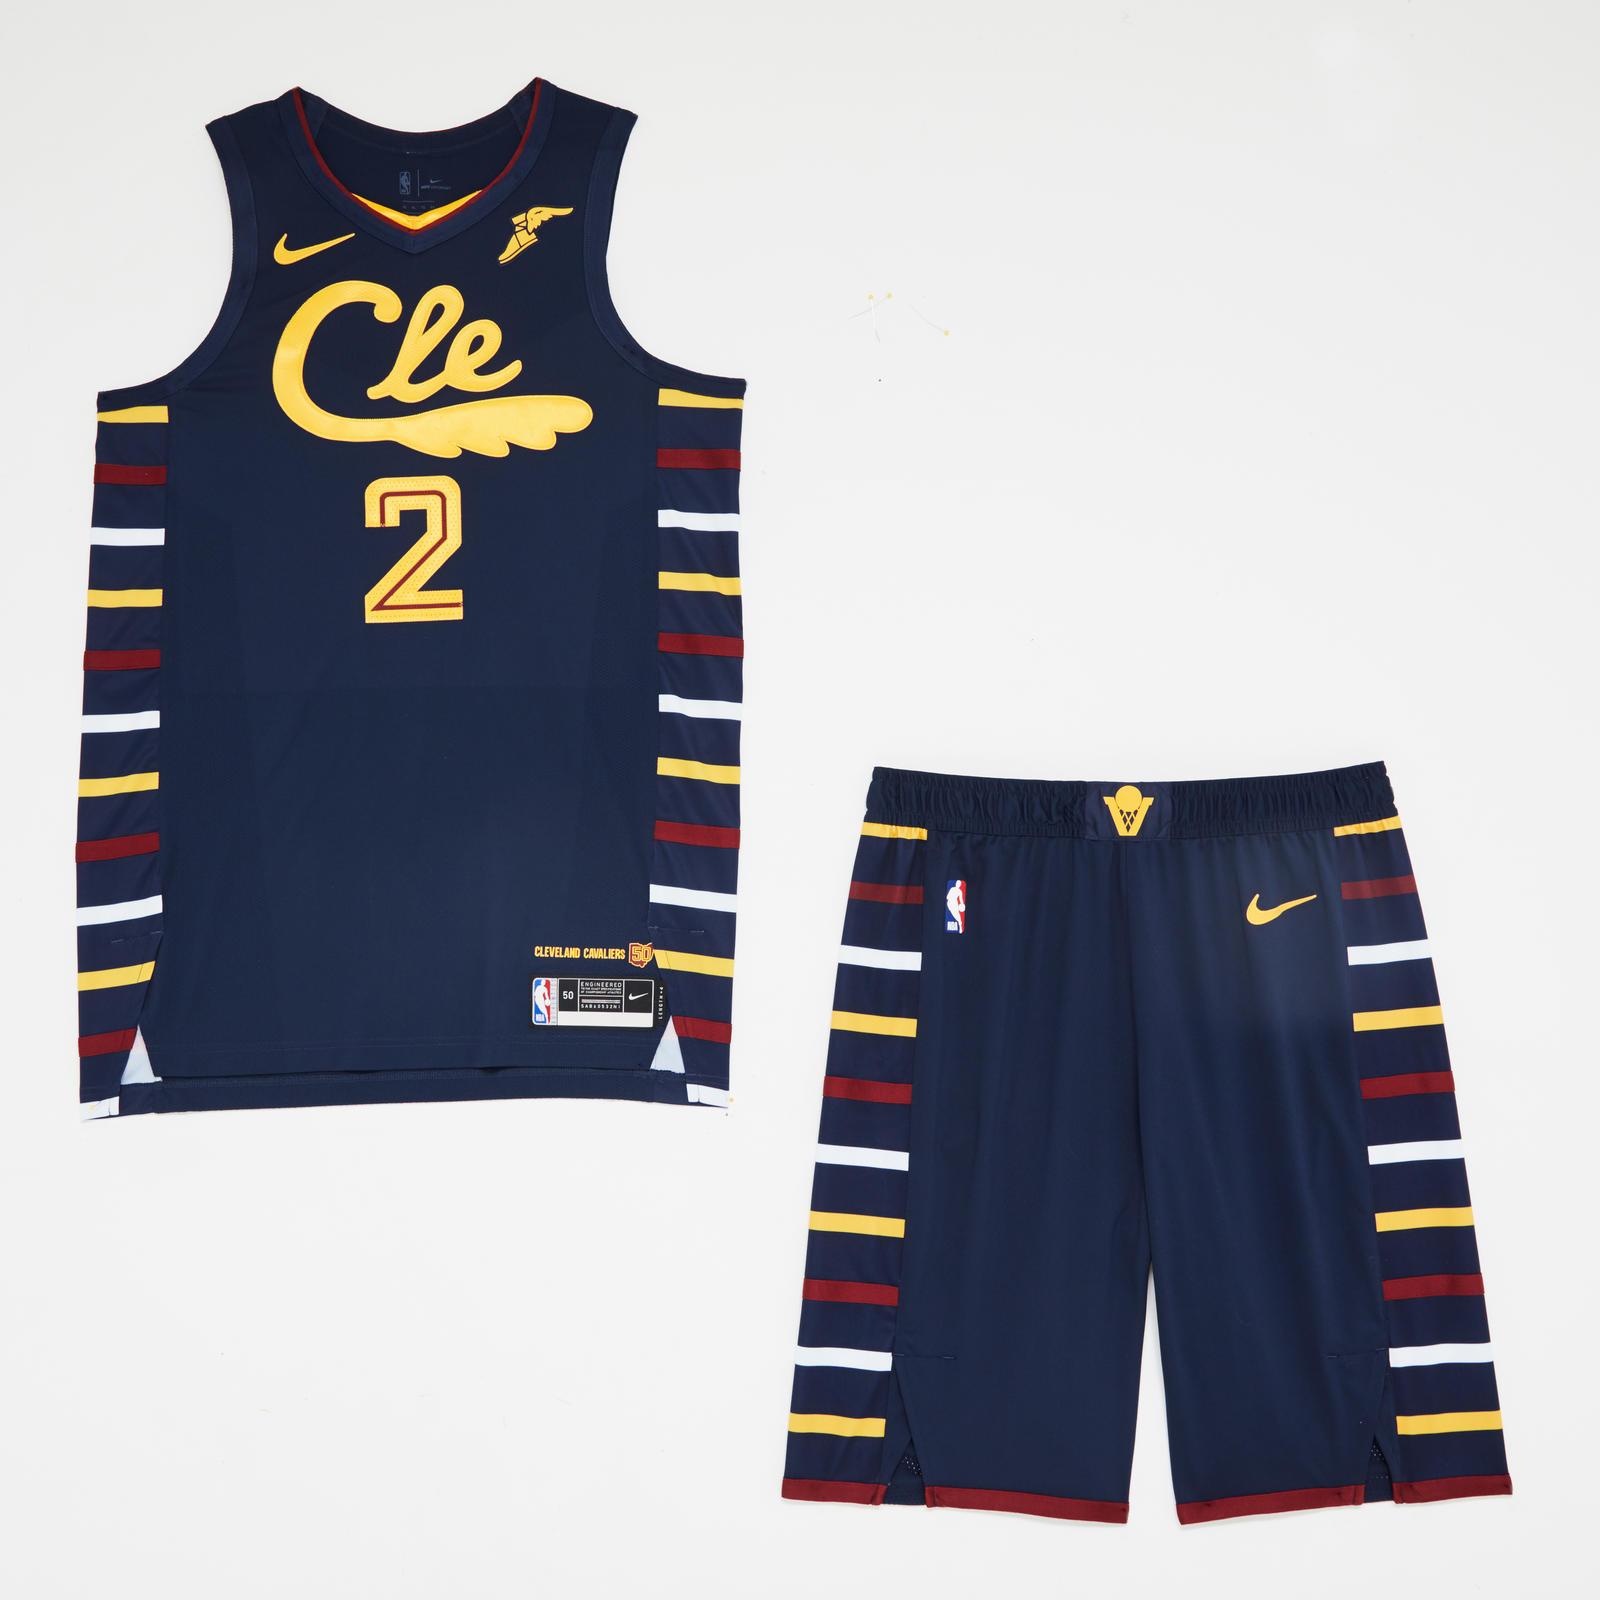 Comprar Camiseta Cleveland Cavaliers